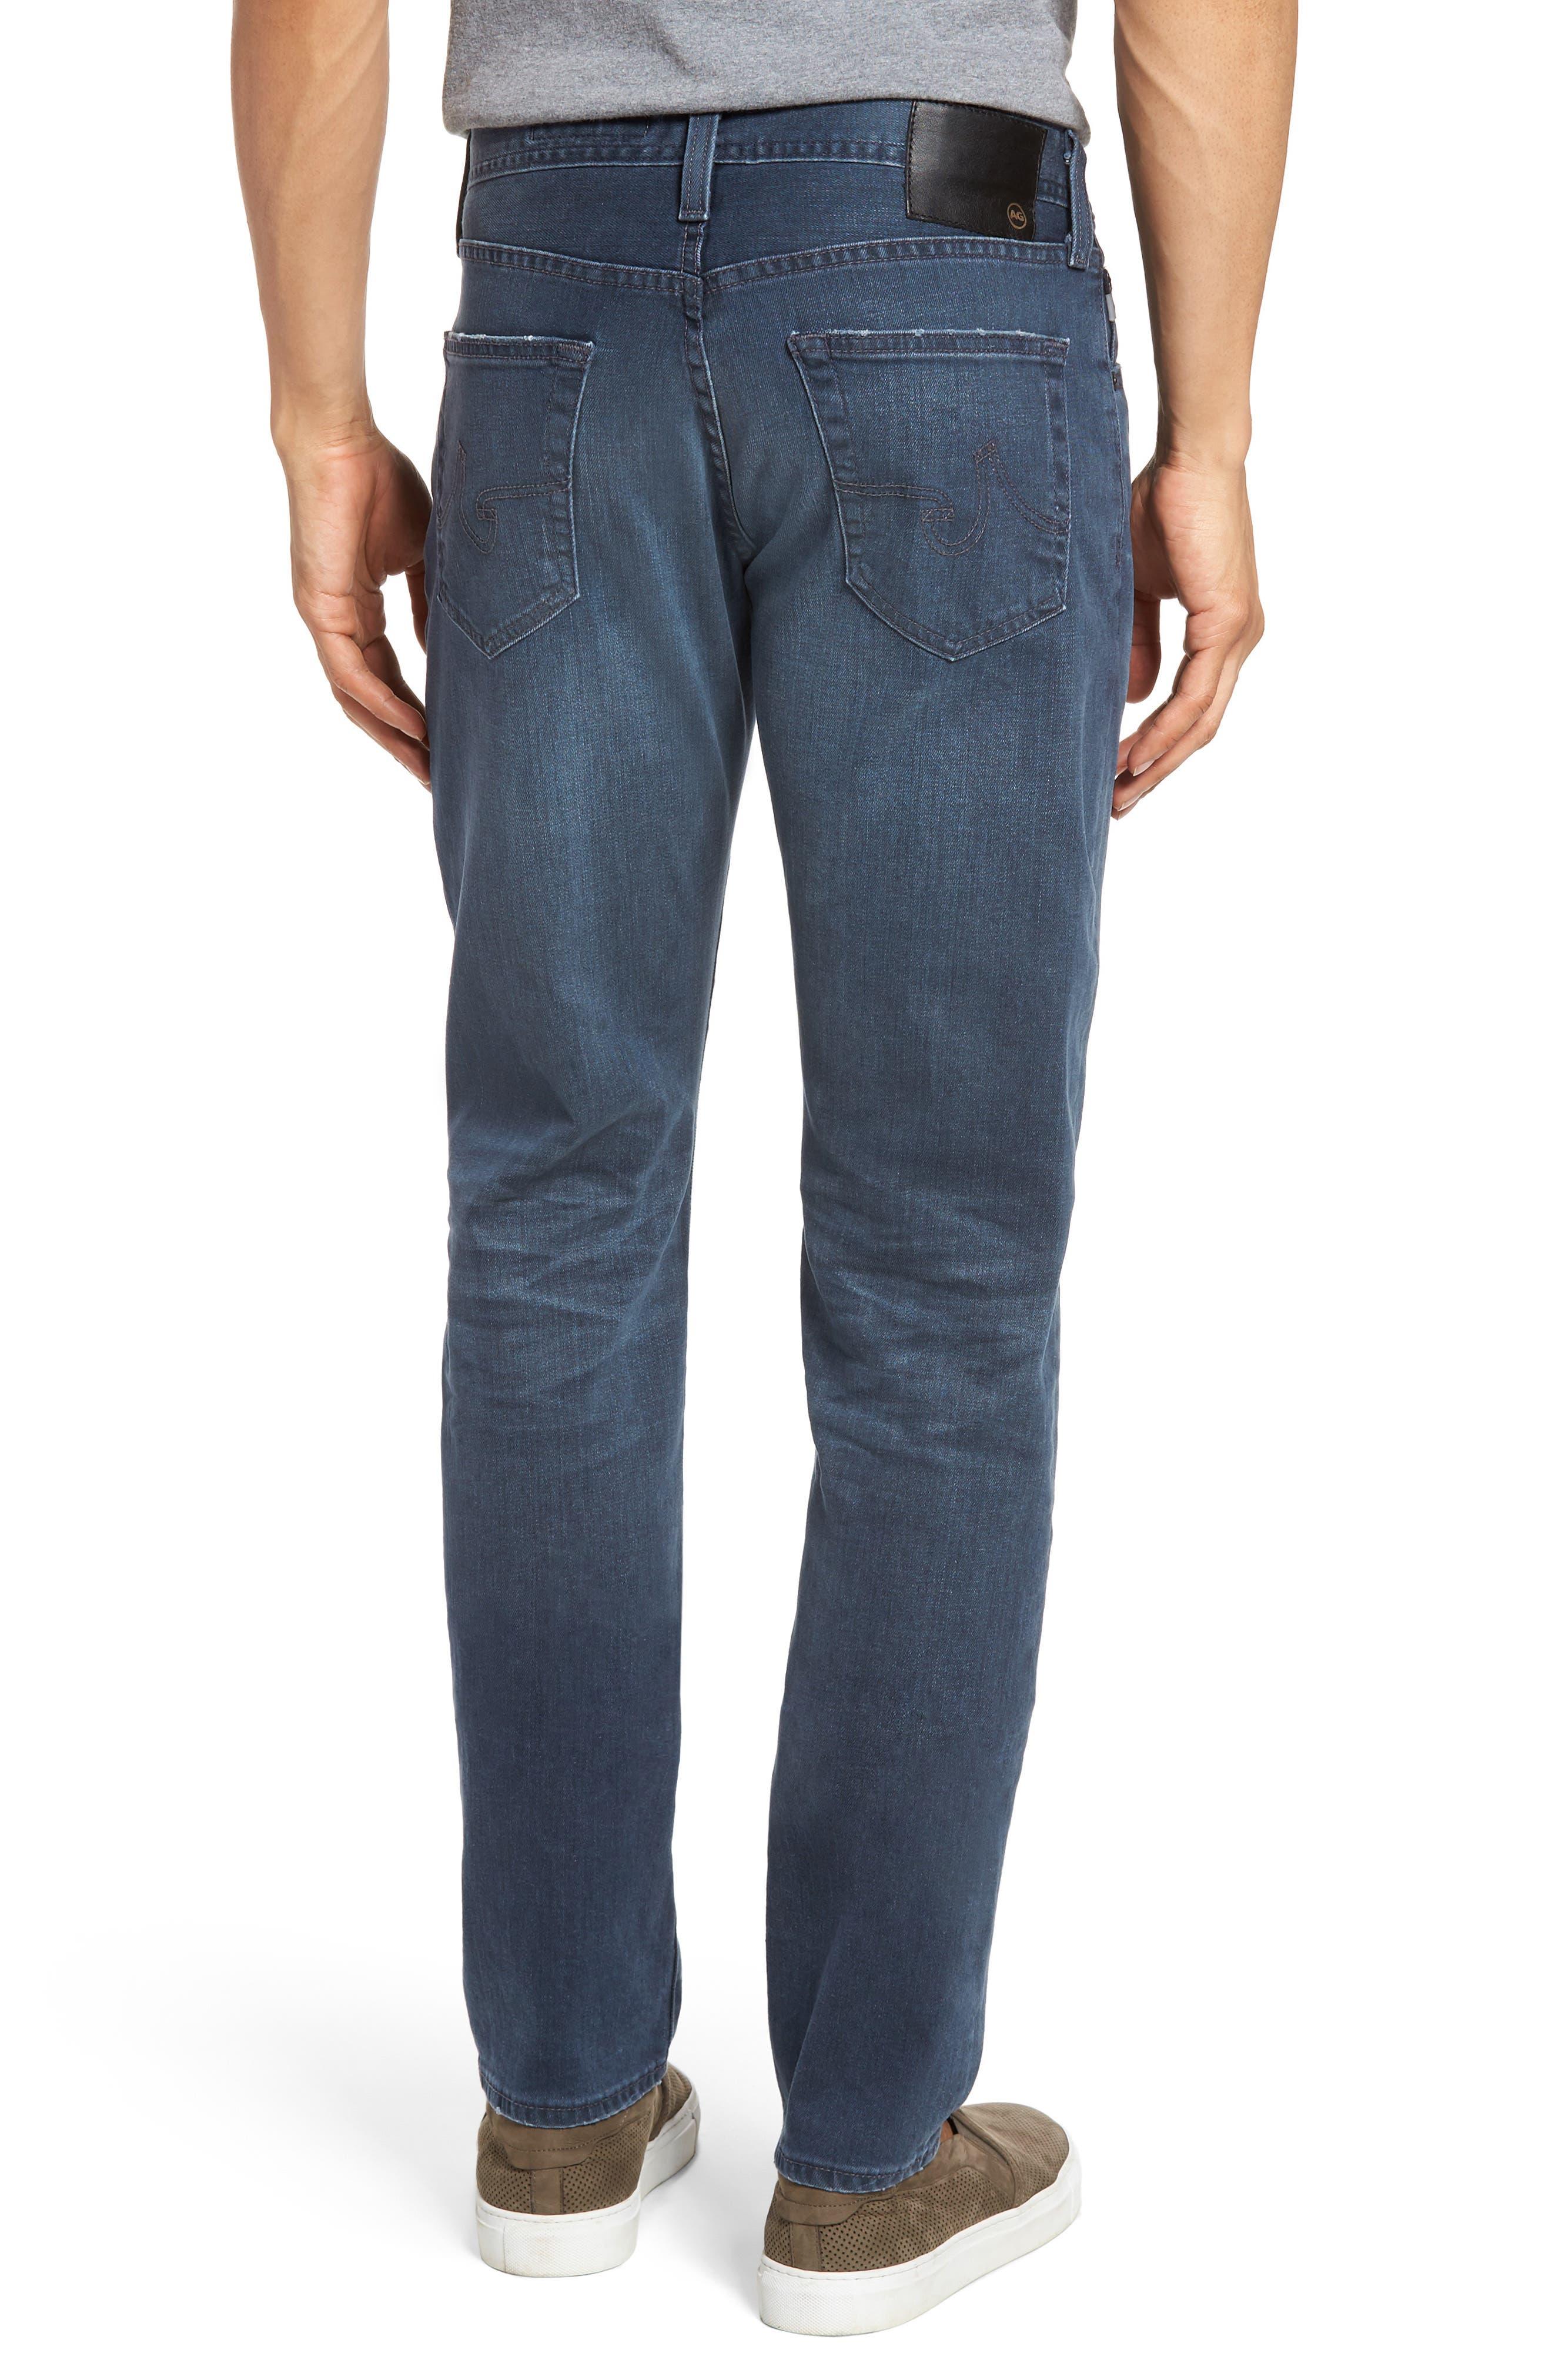 Graduate Slim Straight Leg Jeans,                             Alternate thumbnail 2, color,                             7 YEARS BLUE PERIL